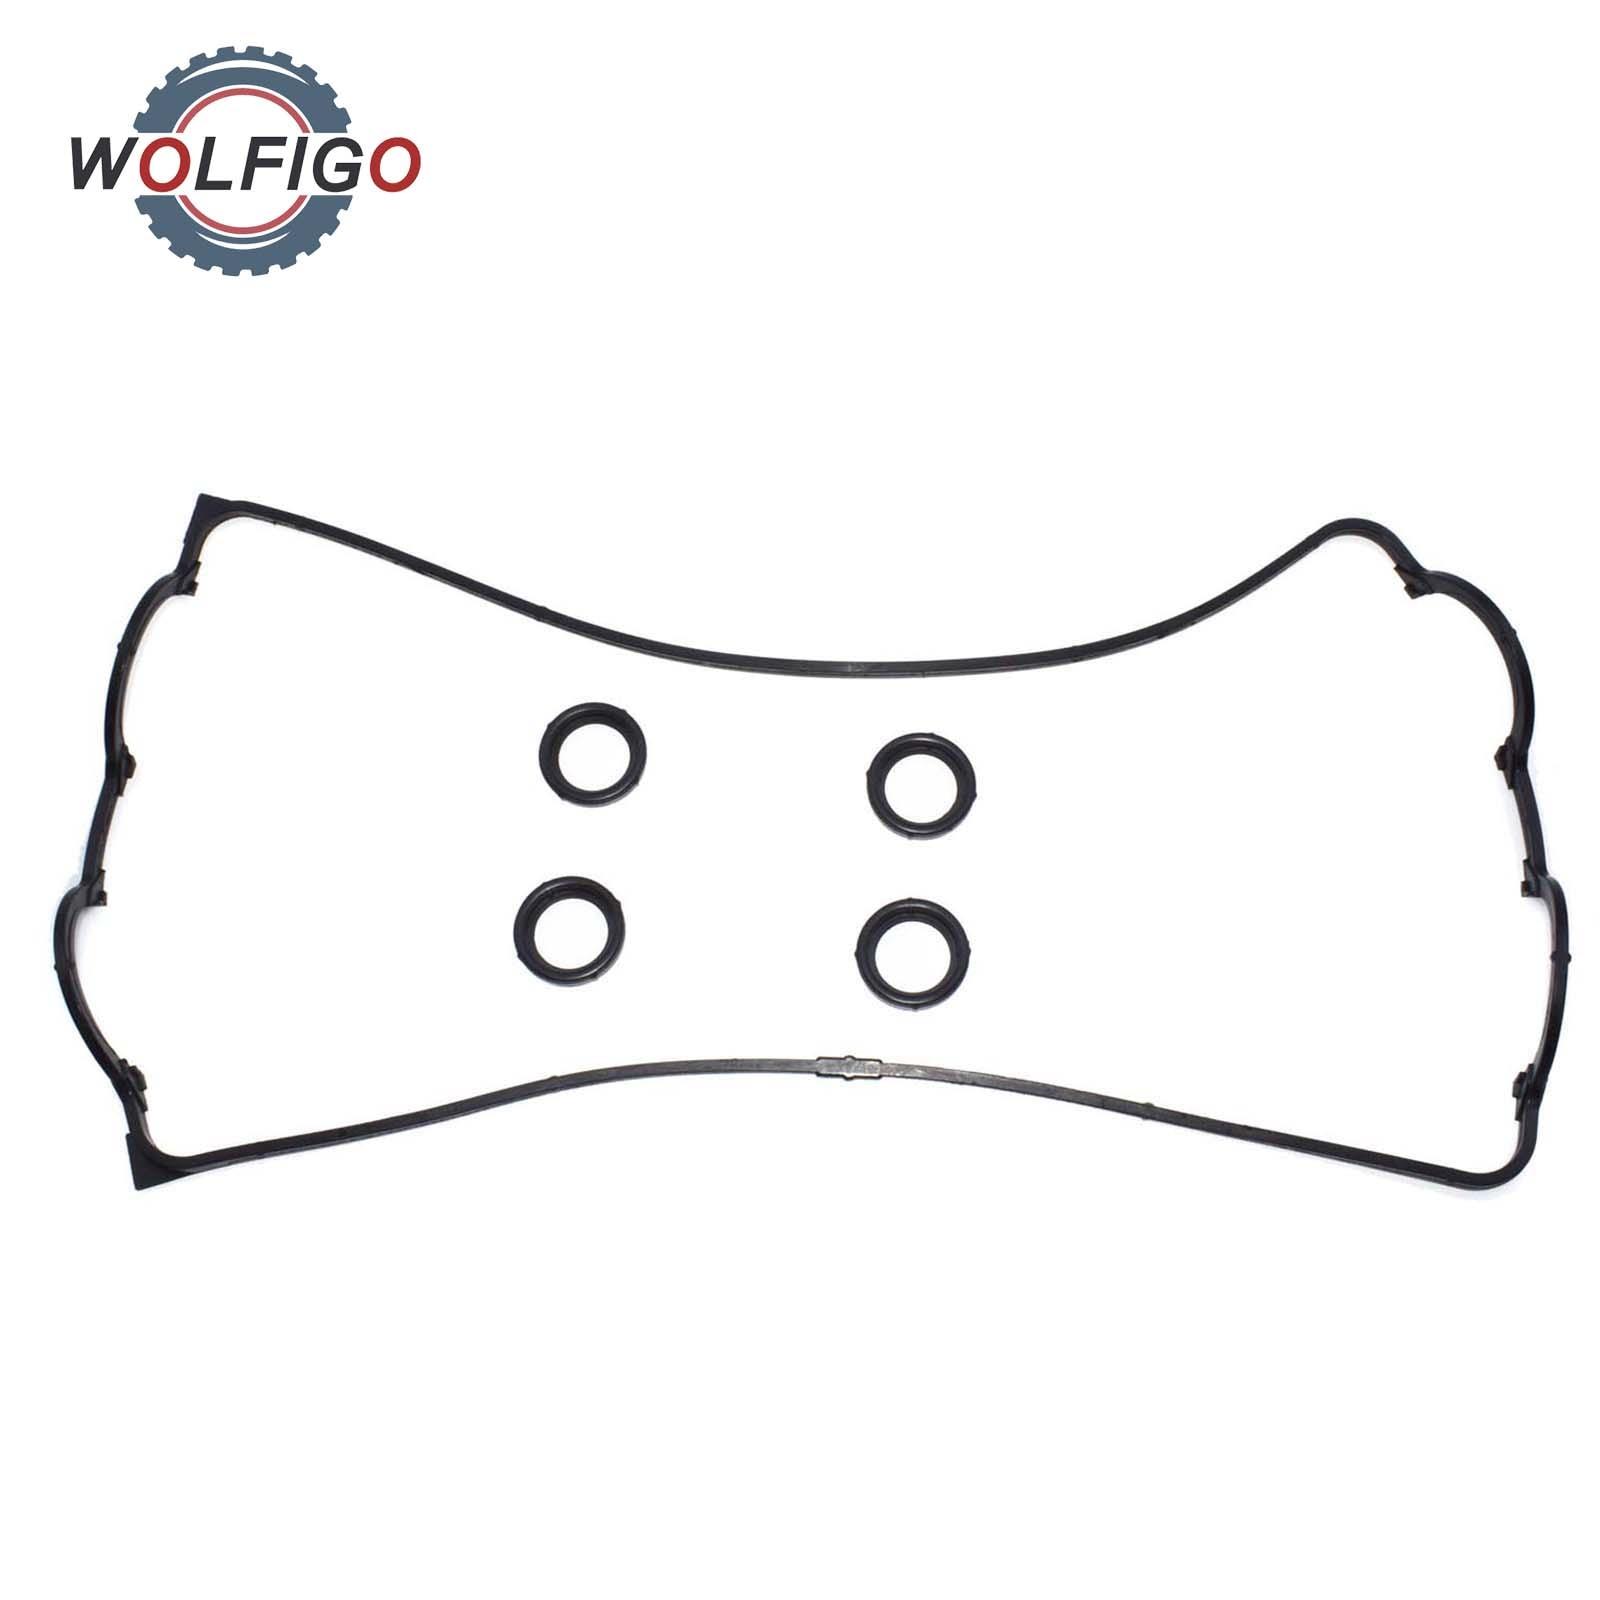 Wolfigo Spark Plug Rubber Grommet Amp Engine Valve Cover